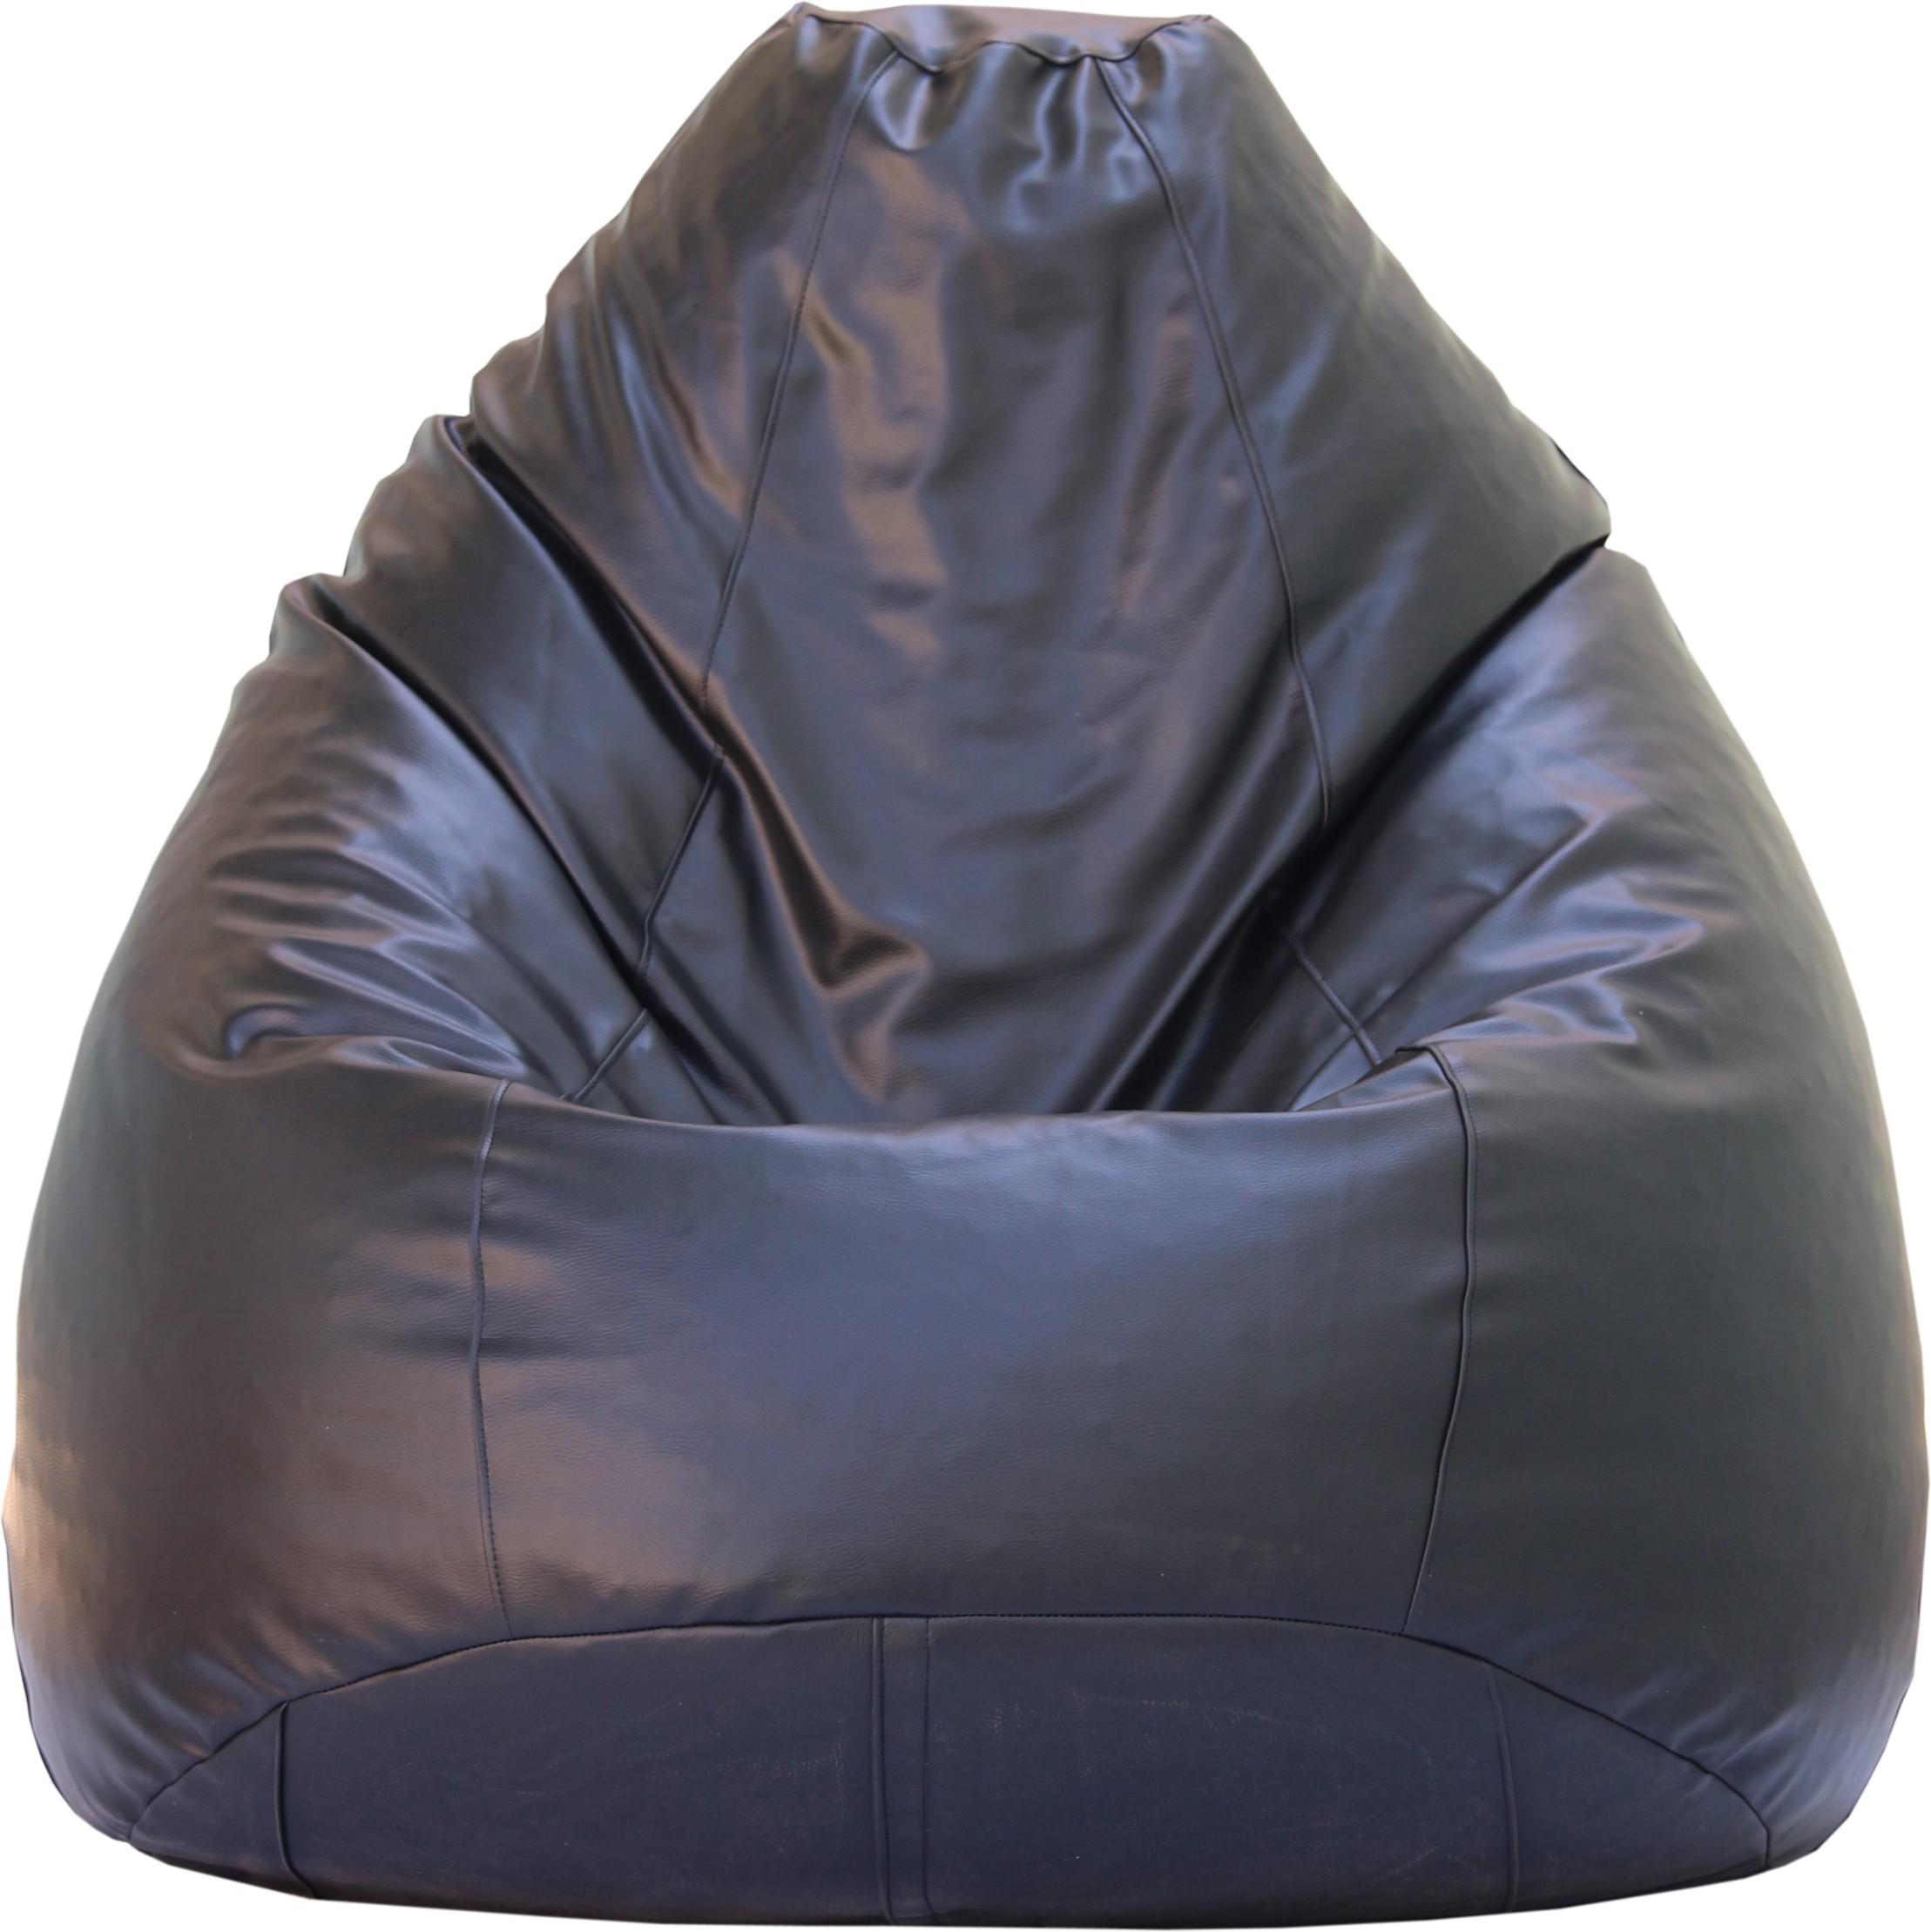 View Beanskart XL Bean Bag XL (Filled With Beans) Bean Bag  With Bean Filling(Grey) Furniture (Beanskart)